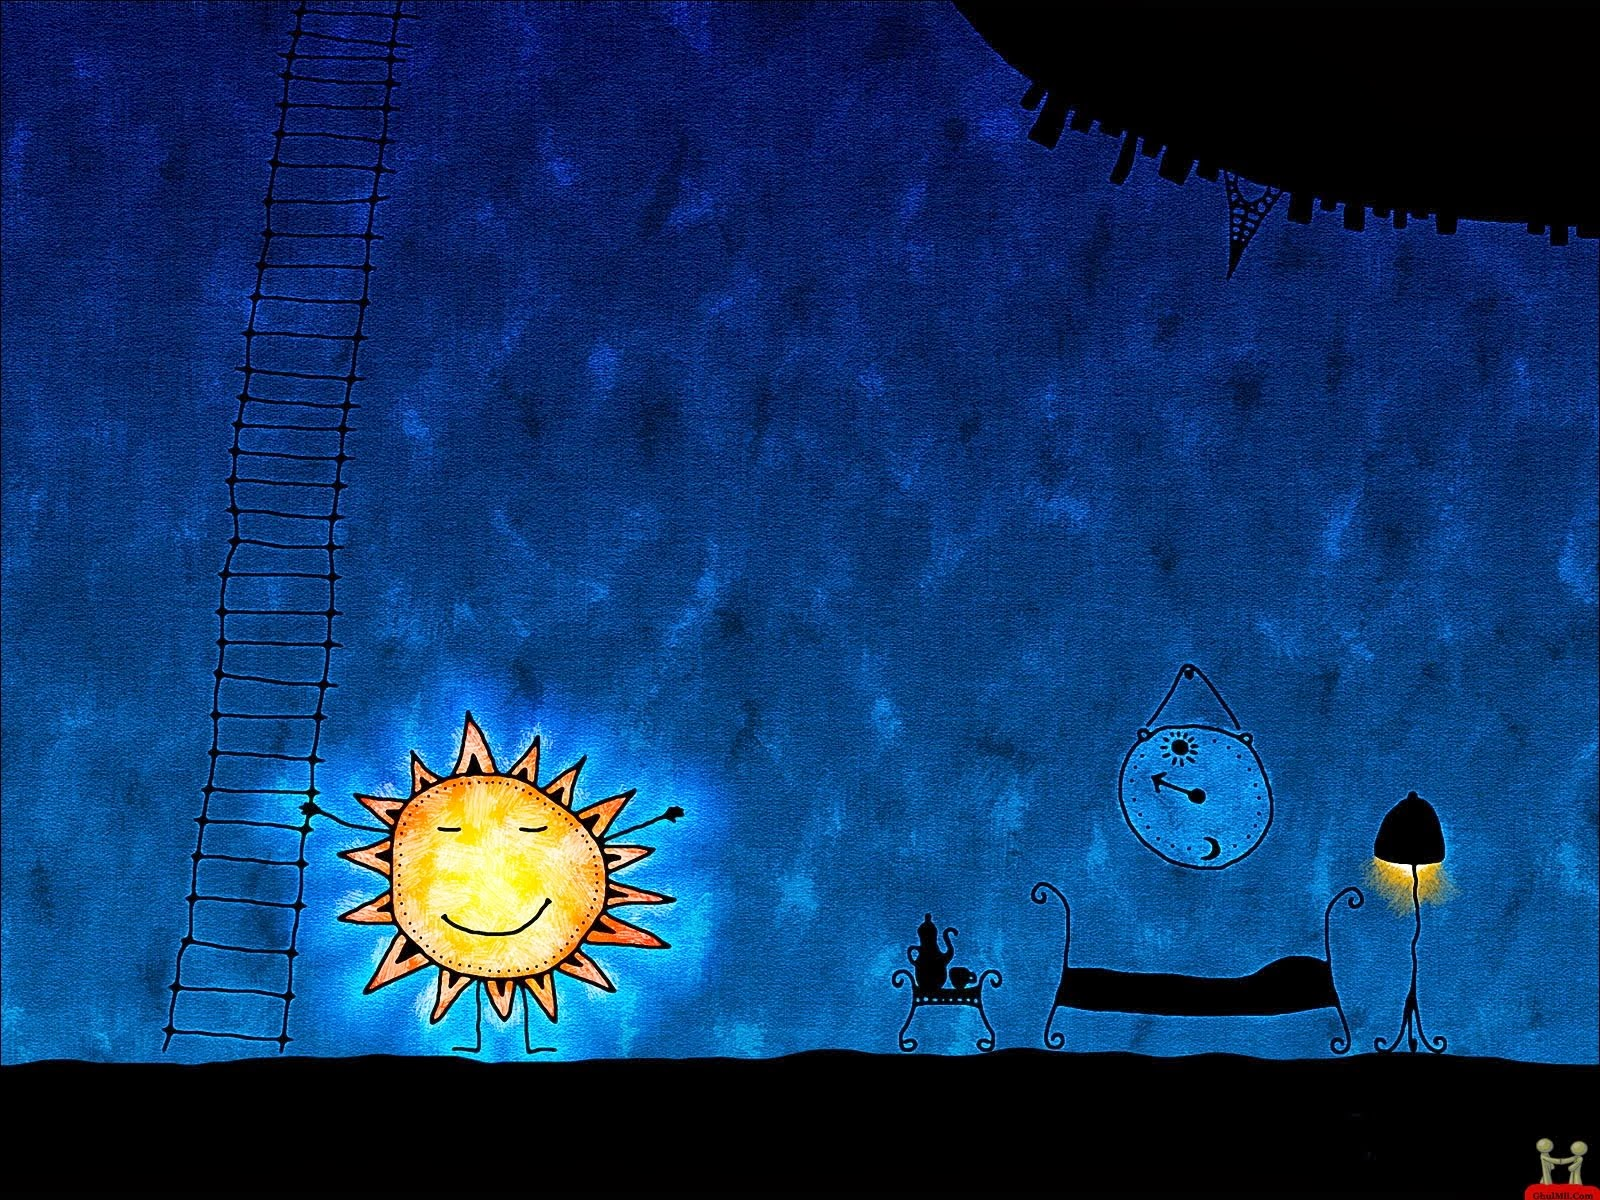 Animated Wallpaper Windows 7 Wallpaper Animated 1600x1200